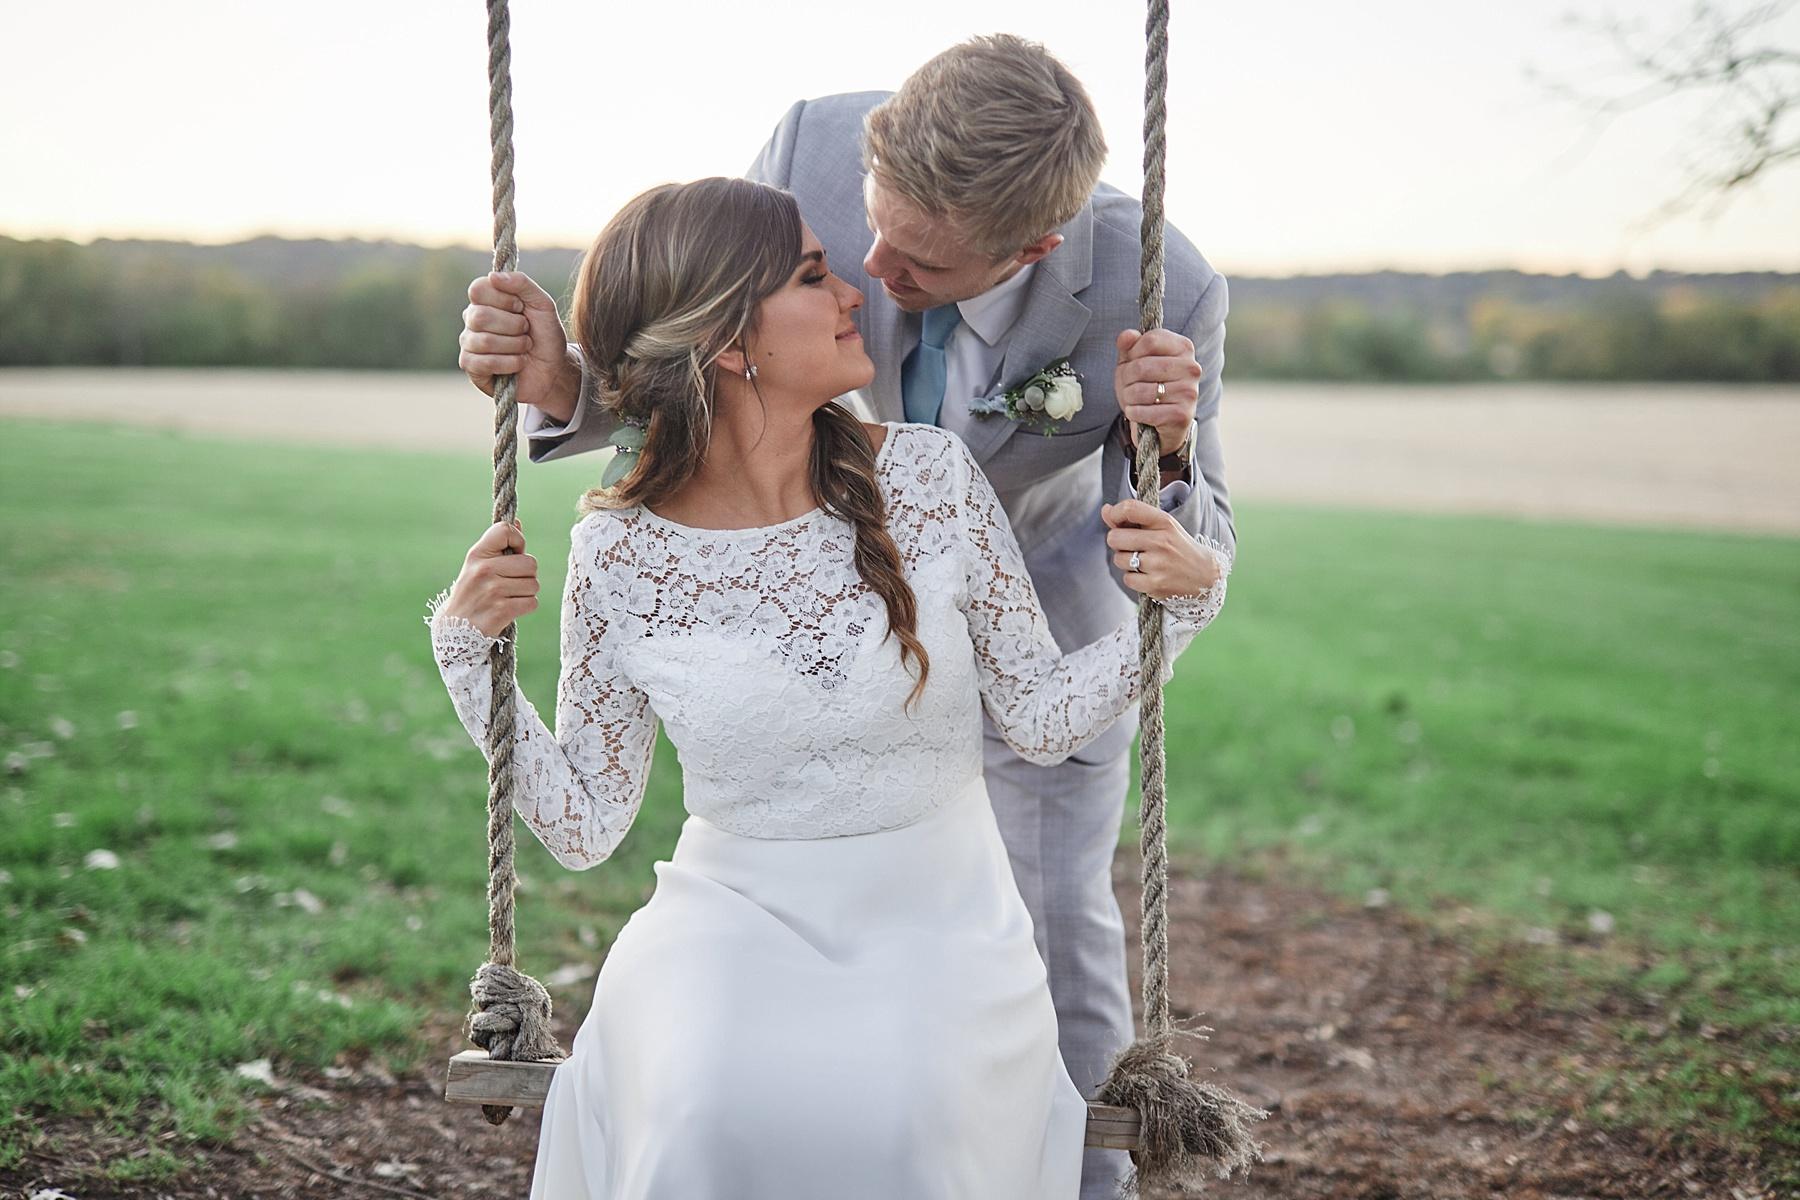 Maywood-Stone-Barn-Wedding-Rochester-Minnesota-Perry-James-Photo_0678.jpg